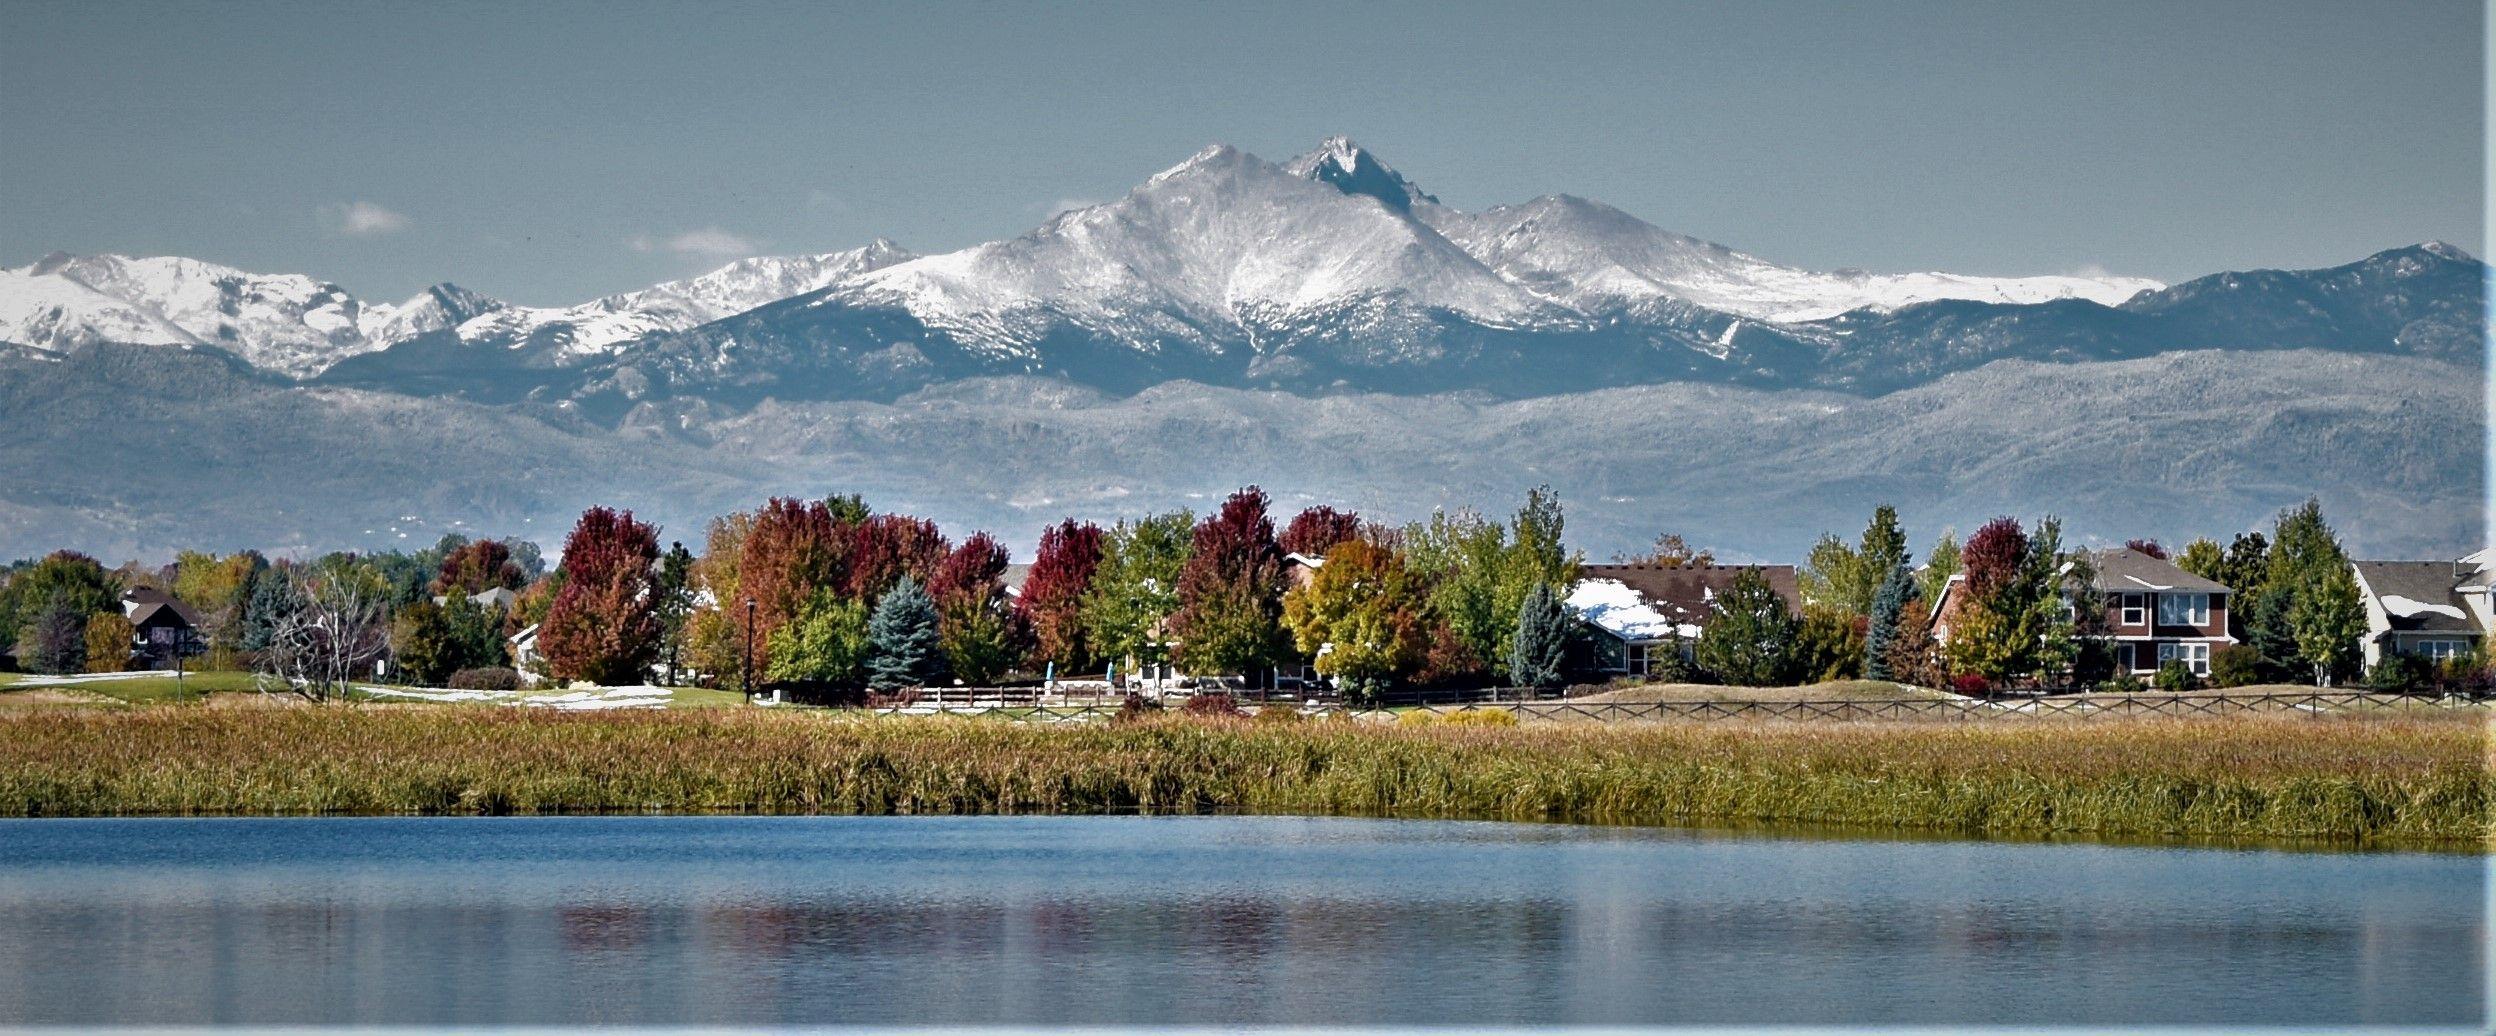 Longmont Christmas Home Tour 2020 Longmont, Colorado Skyline in 2020 | Longmont colorado, Colorado